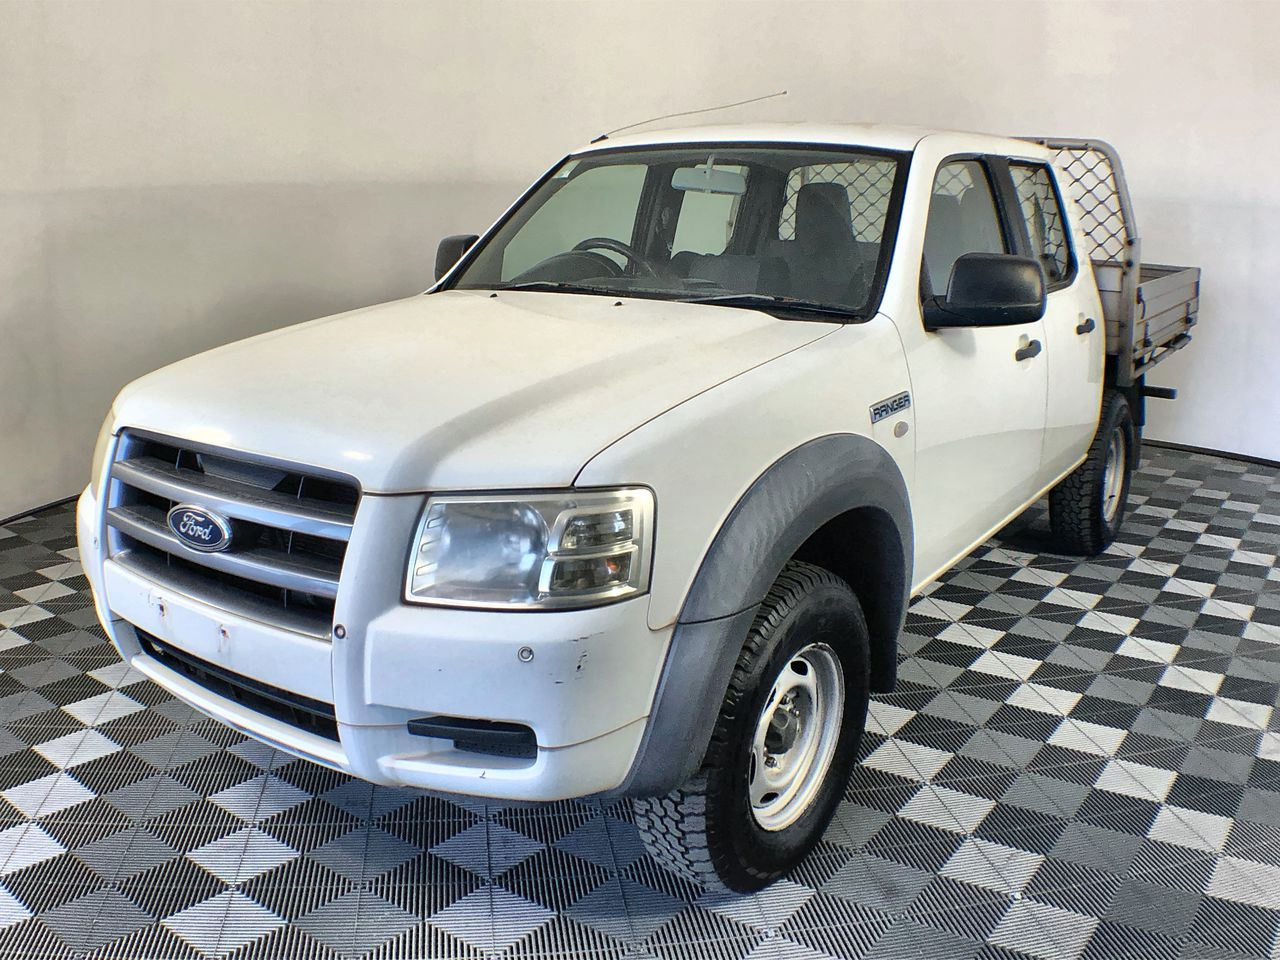 2007 Ford Ranger XL T/Diesel Auto Dual Cab Ute 113,566 kms